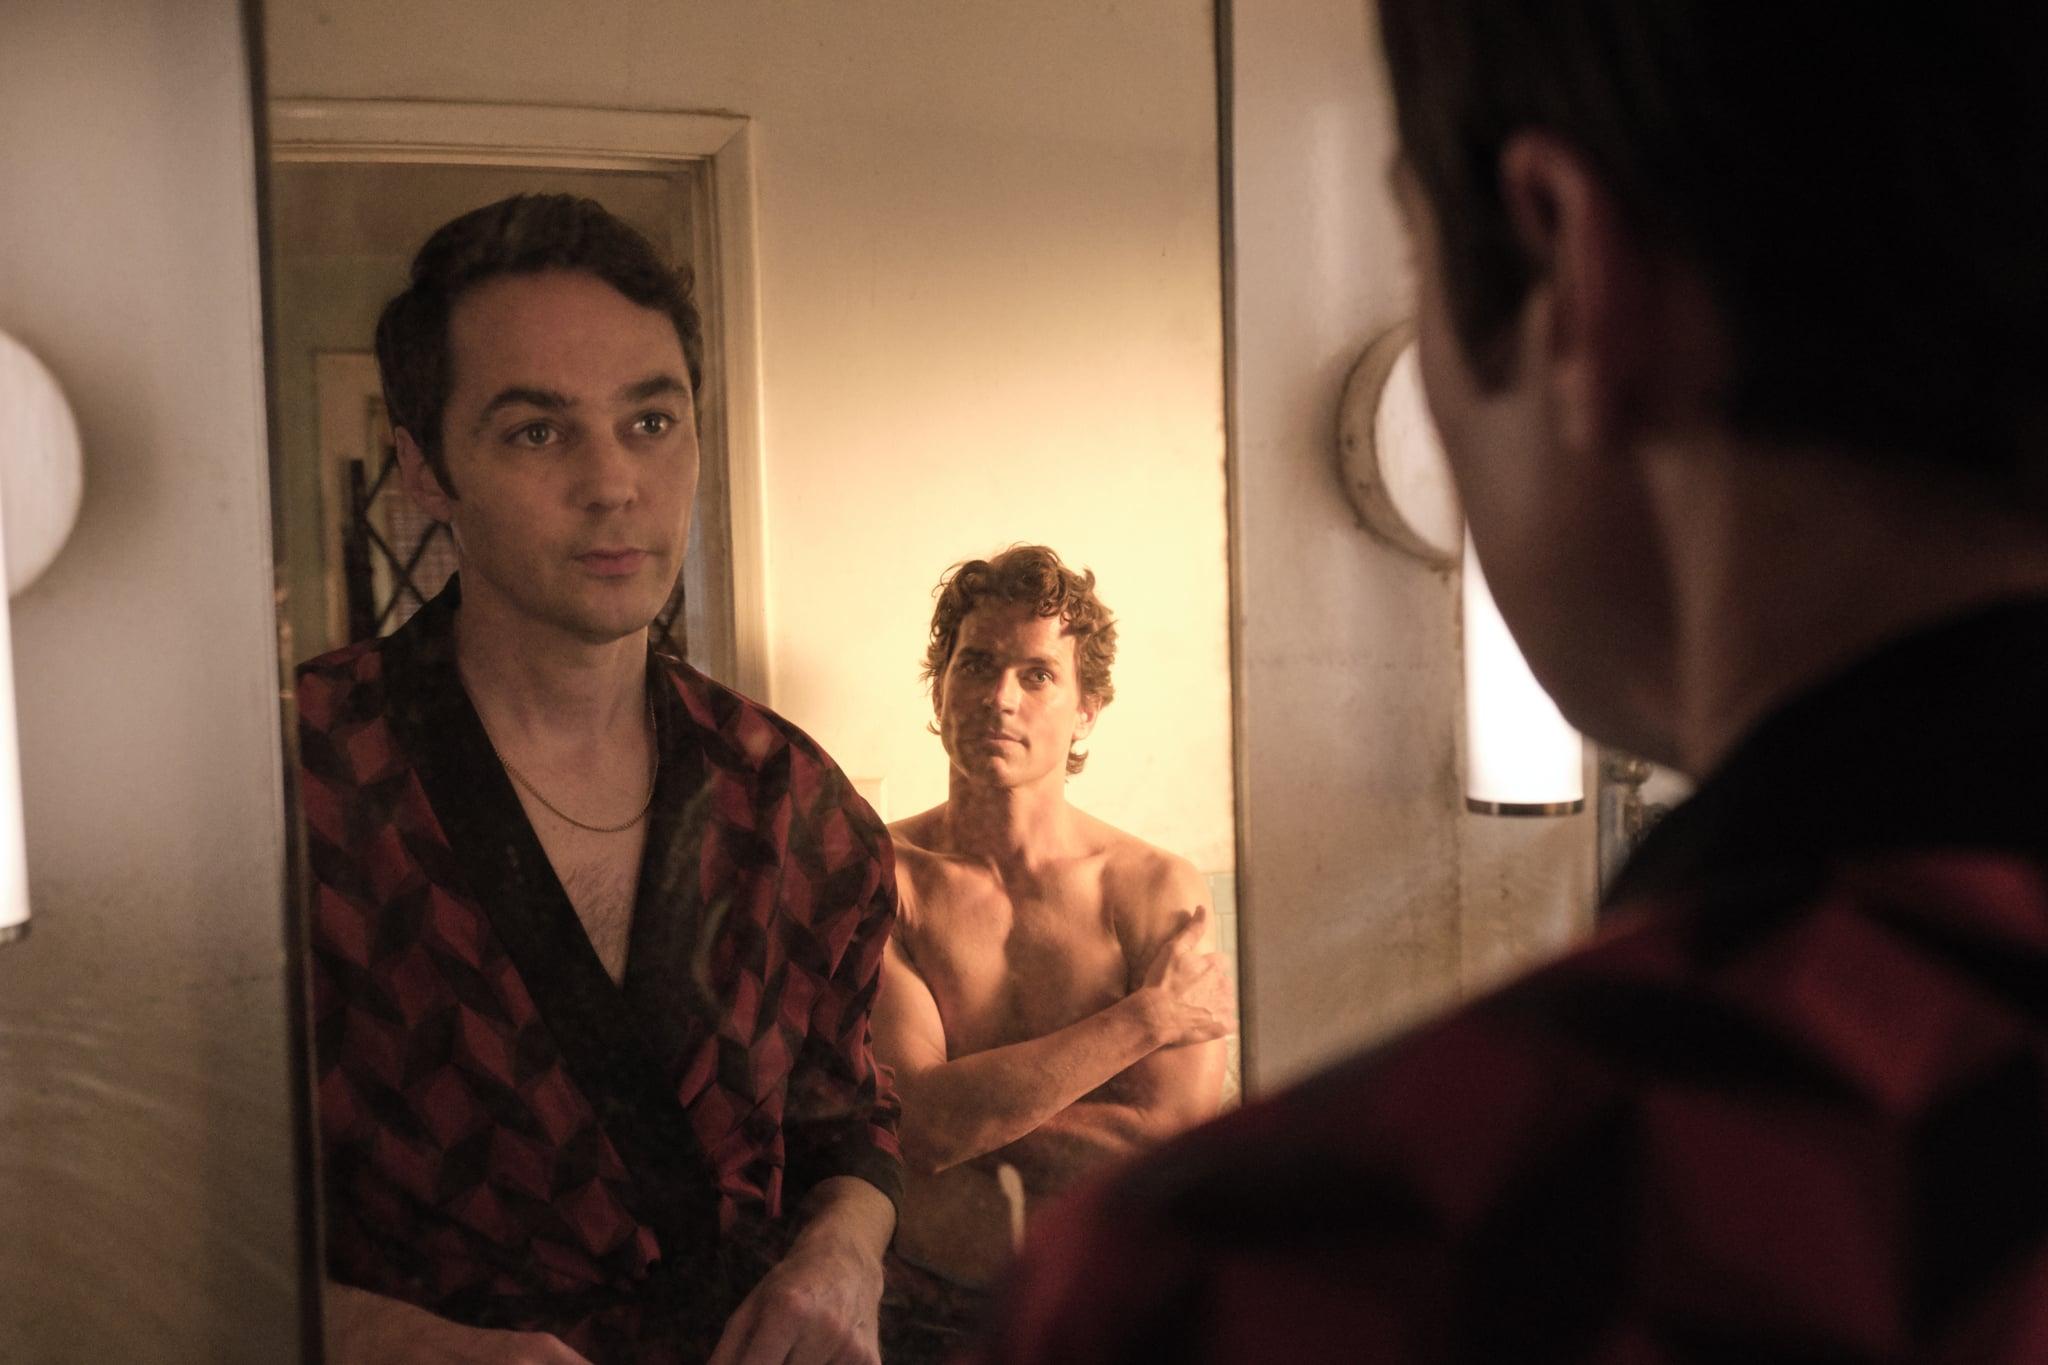 THE BOYS IN THE BAND (2020)Jim Parsons as Michael and Matt Bomer as Donald.Cr. Scott Everett White/NETFLIX 2020